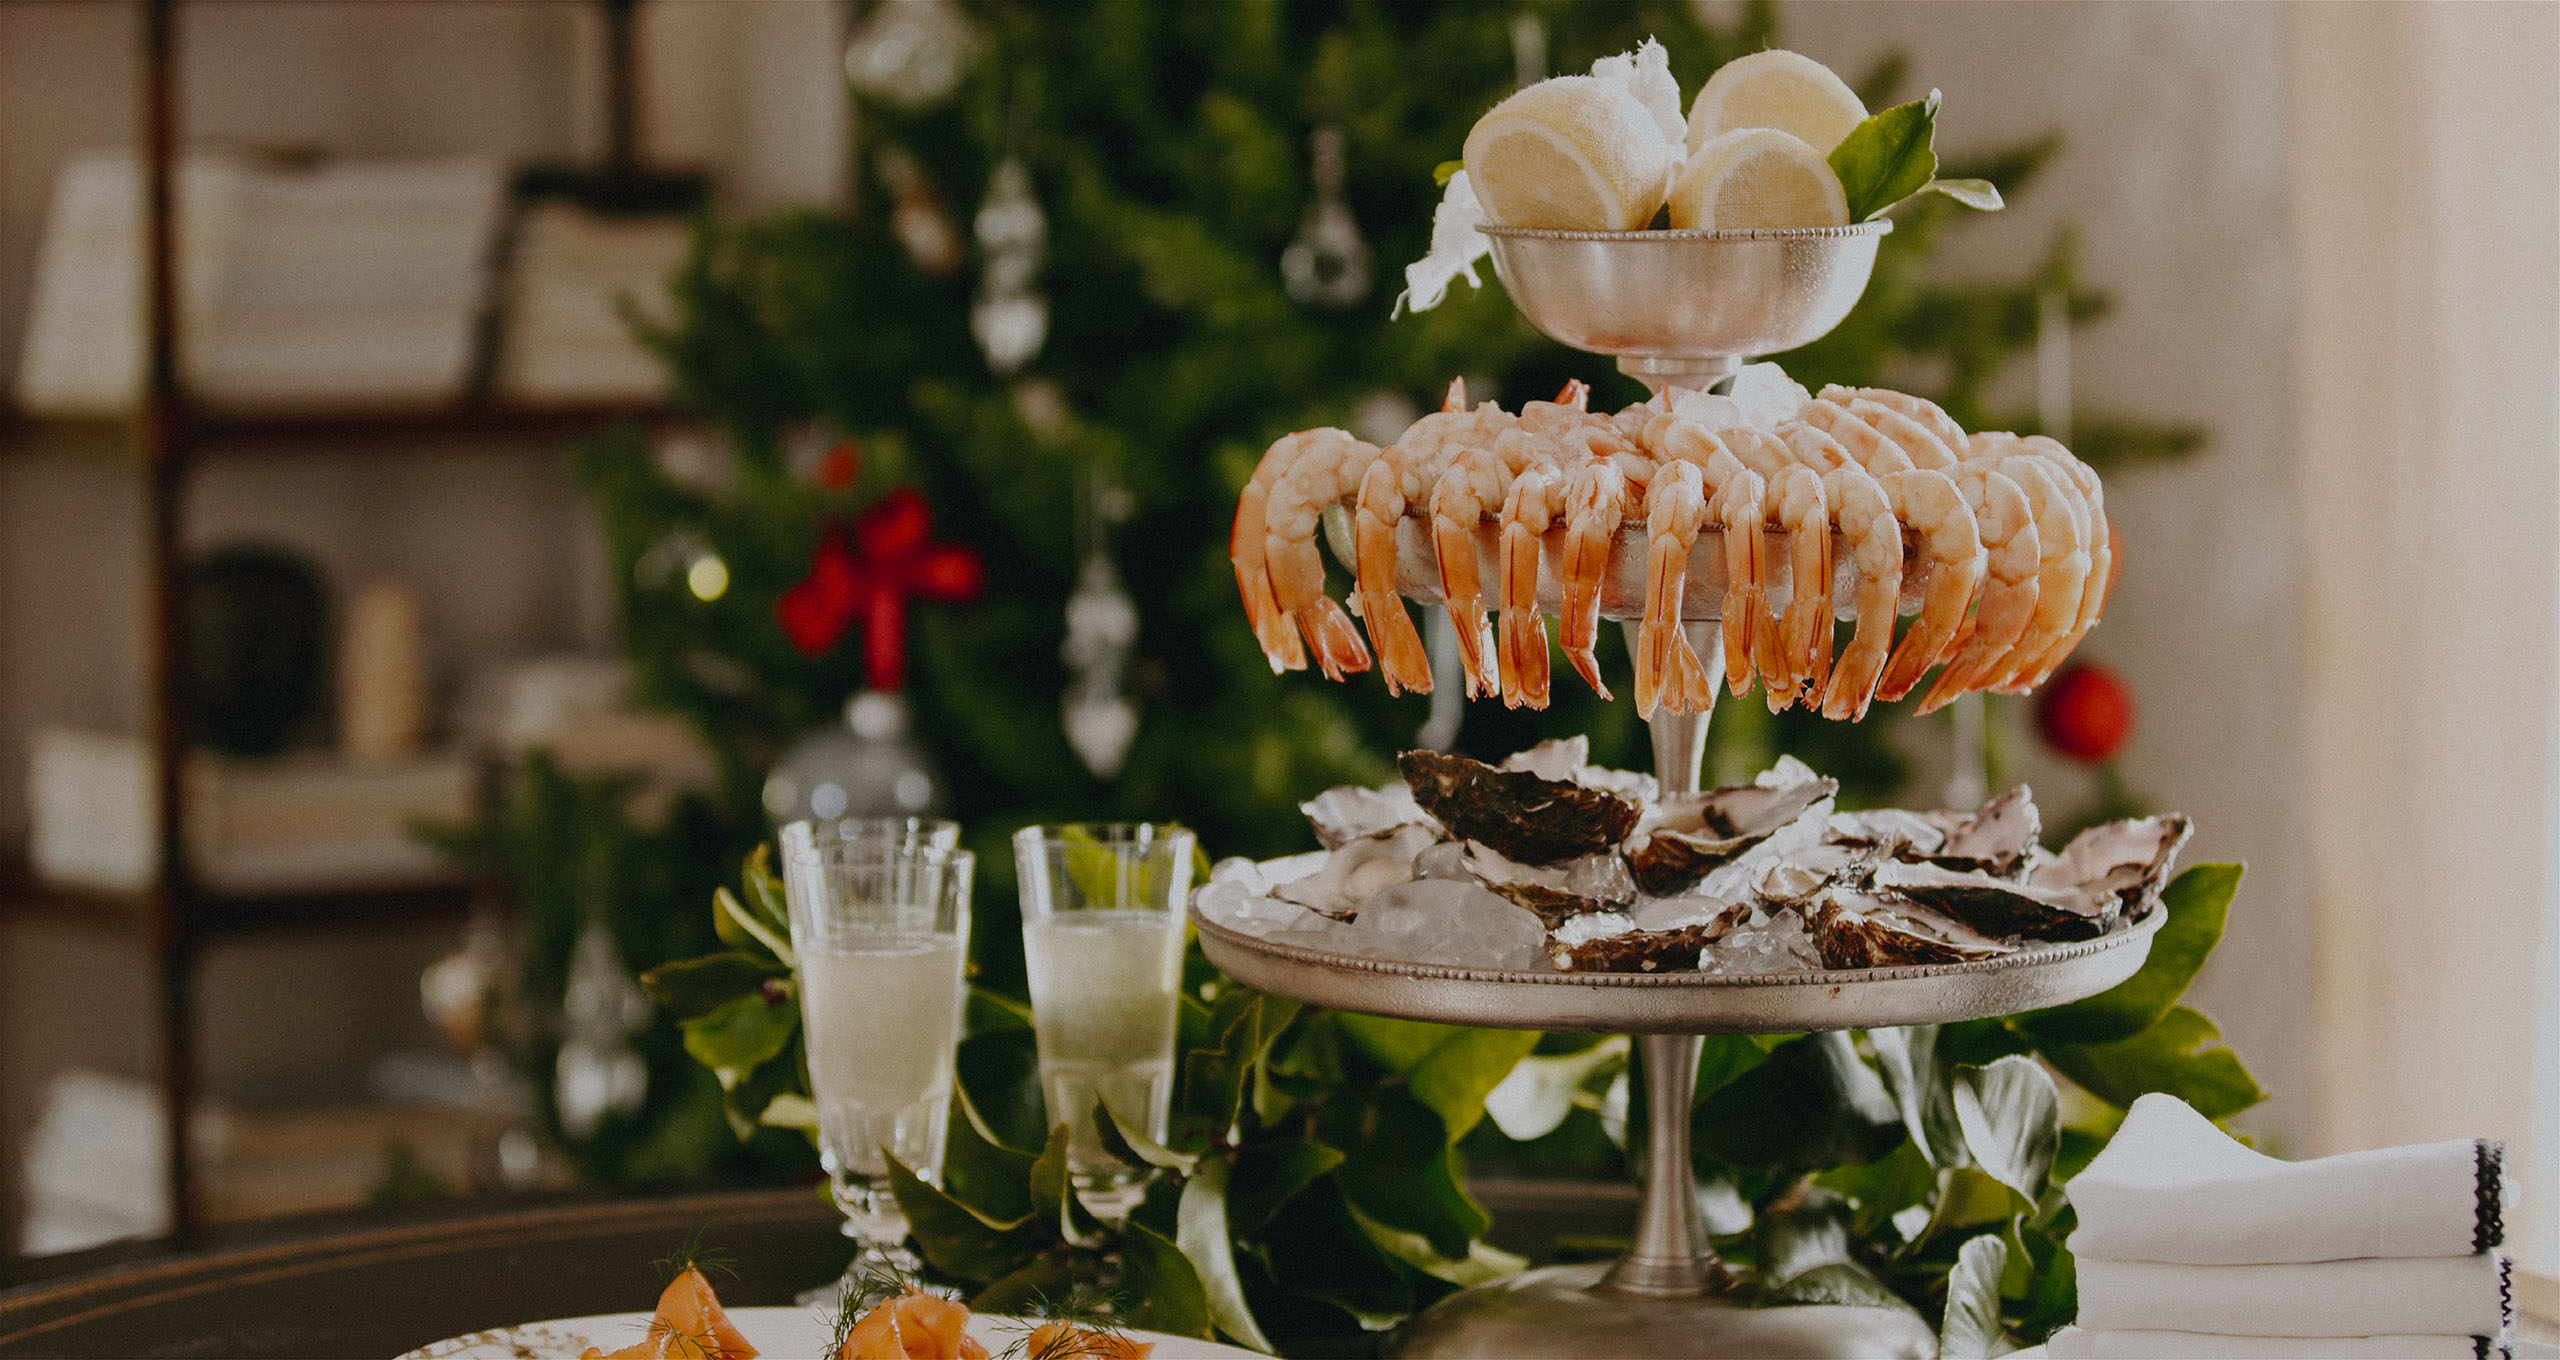 Peter Rowland Christmas Seafood Tower Table 2019